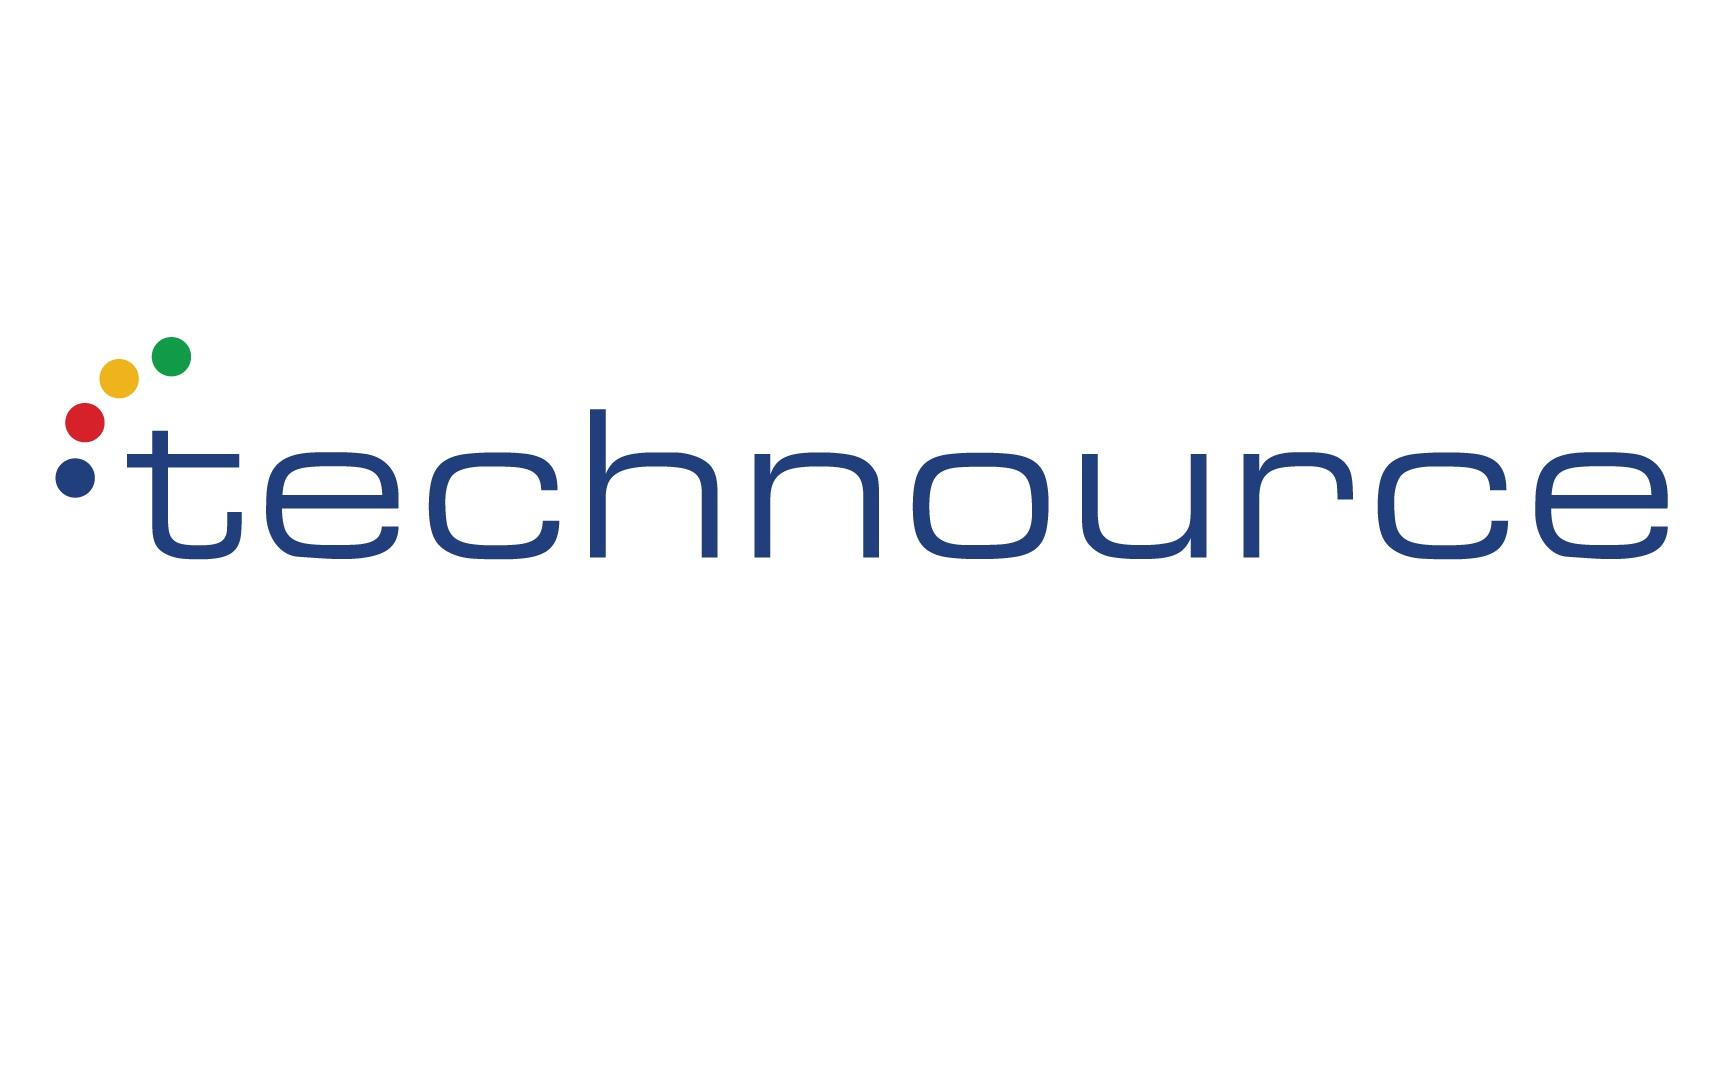 Technource